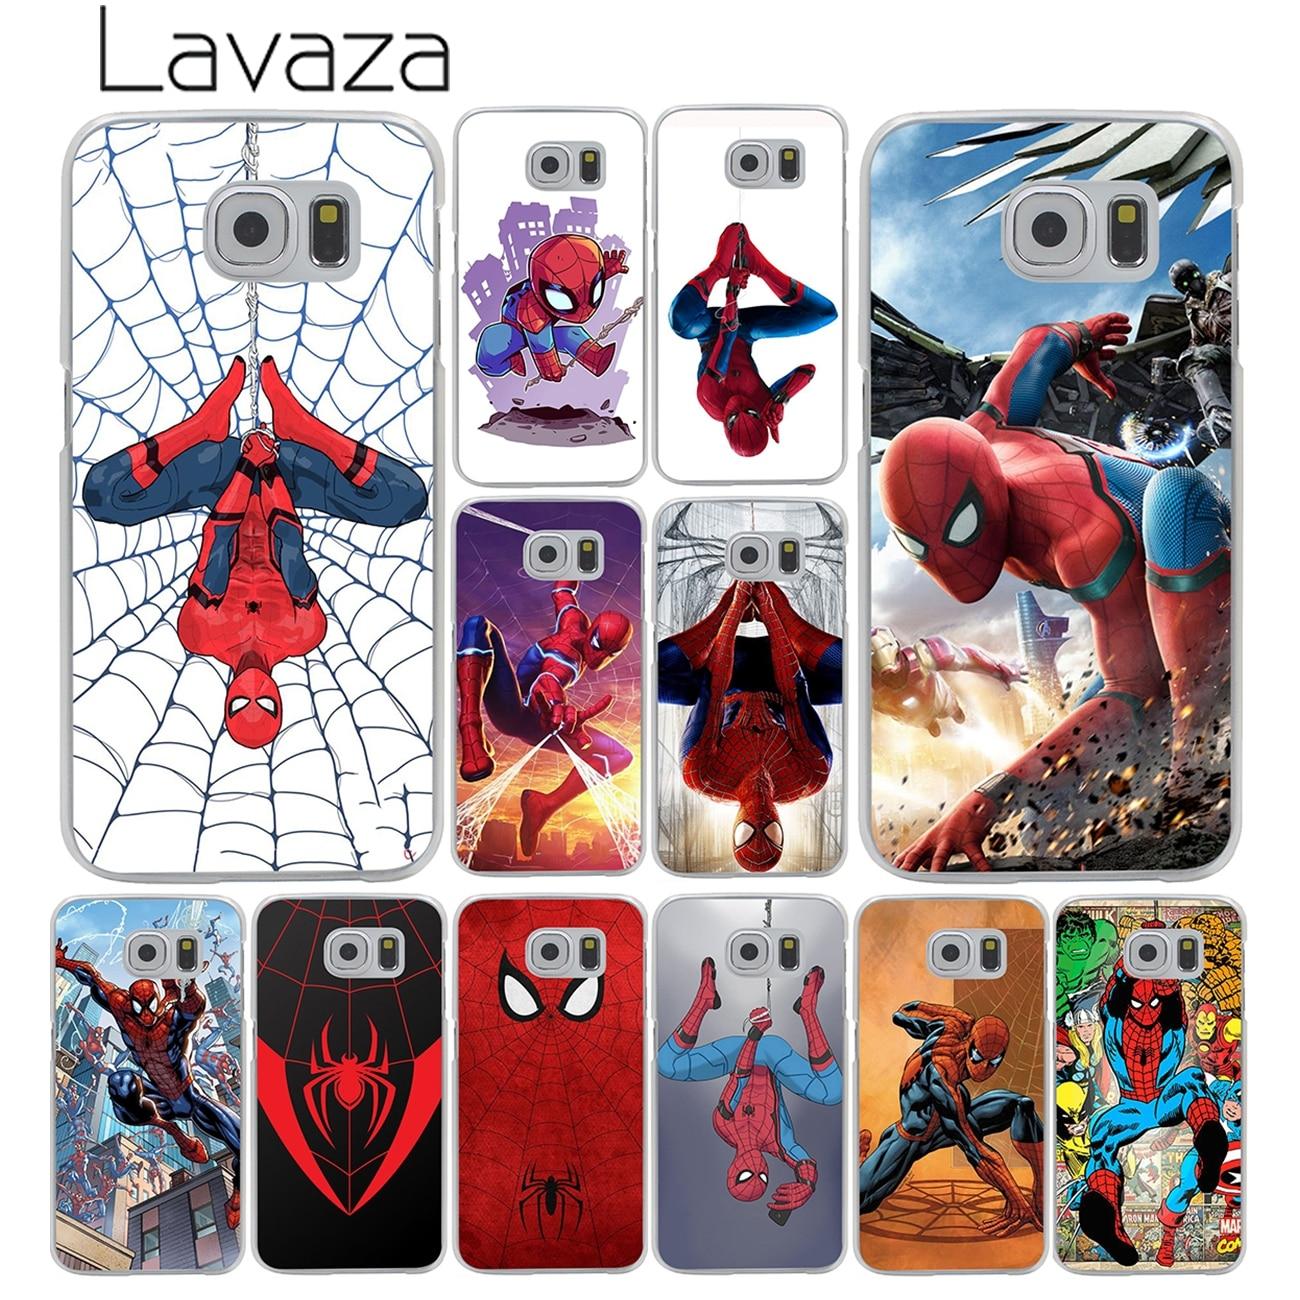 Lavaza Marvel Comics <font><b>Spider</b></font>-<font><b>Man</b></font> <font><b>Spider</b></font> <font><b>Man</b></font> Homecoming Case Cover for <font><b>Samsung</b></font> <font><b>Galaxy</b></font> S8 Plus S3 S4 S5 & <font><b>Mini</b></font> S7 Edge S6 Edge Plus